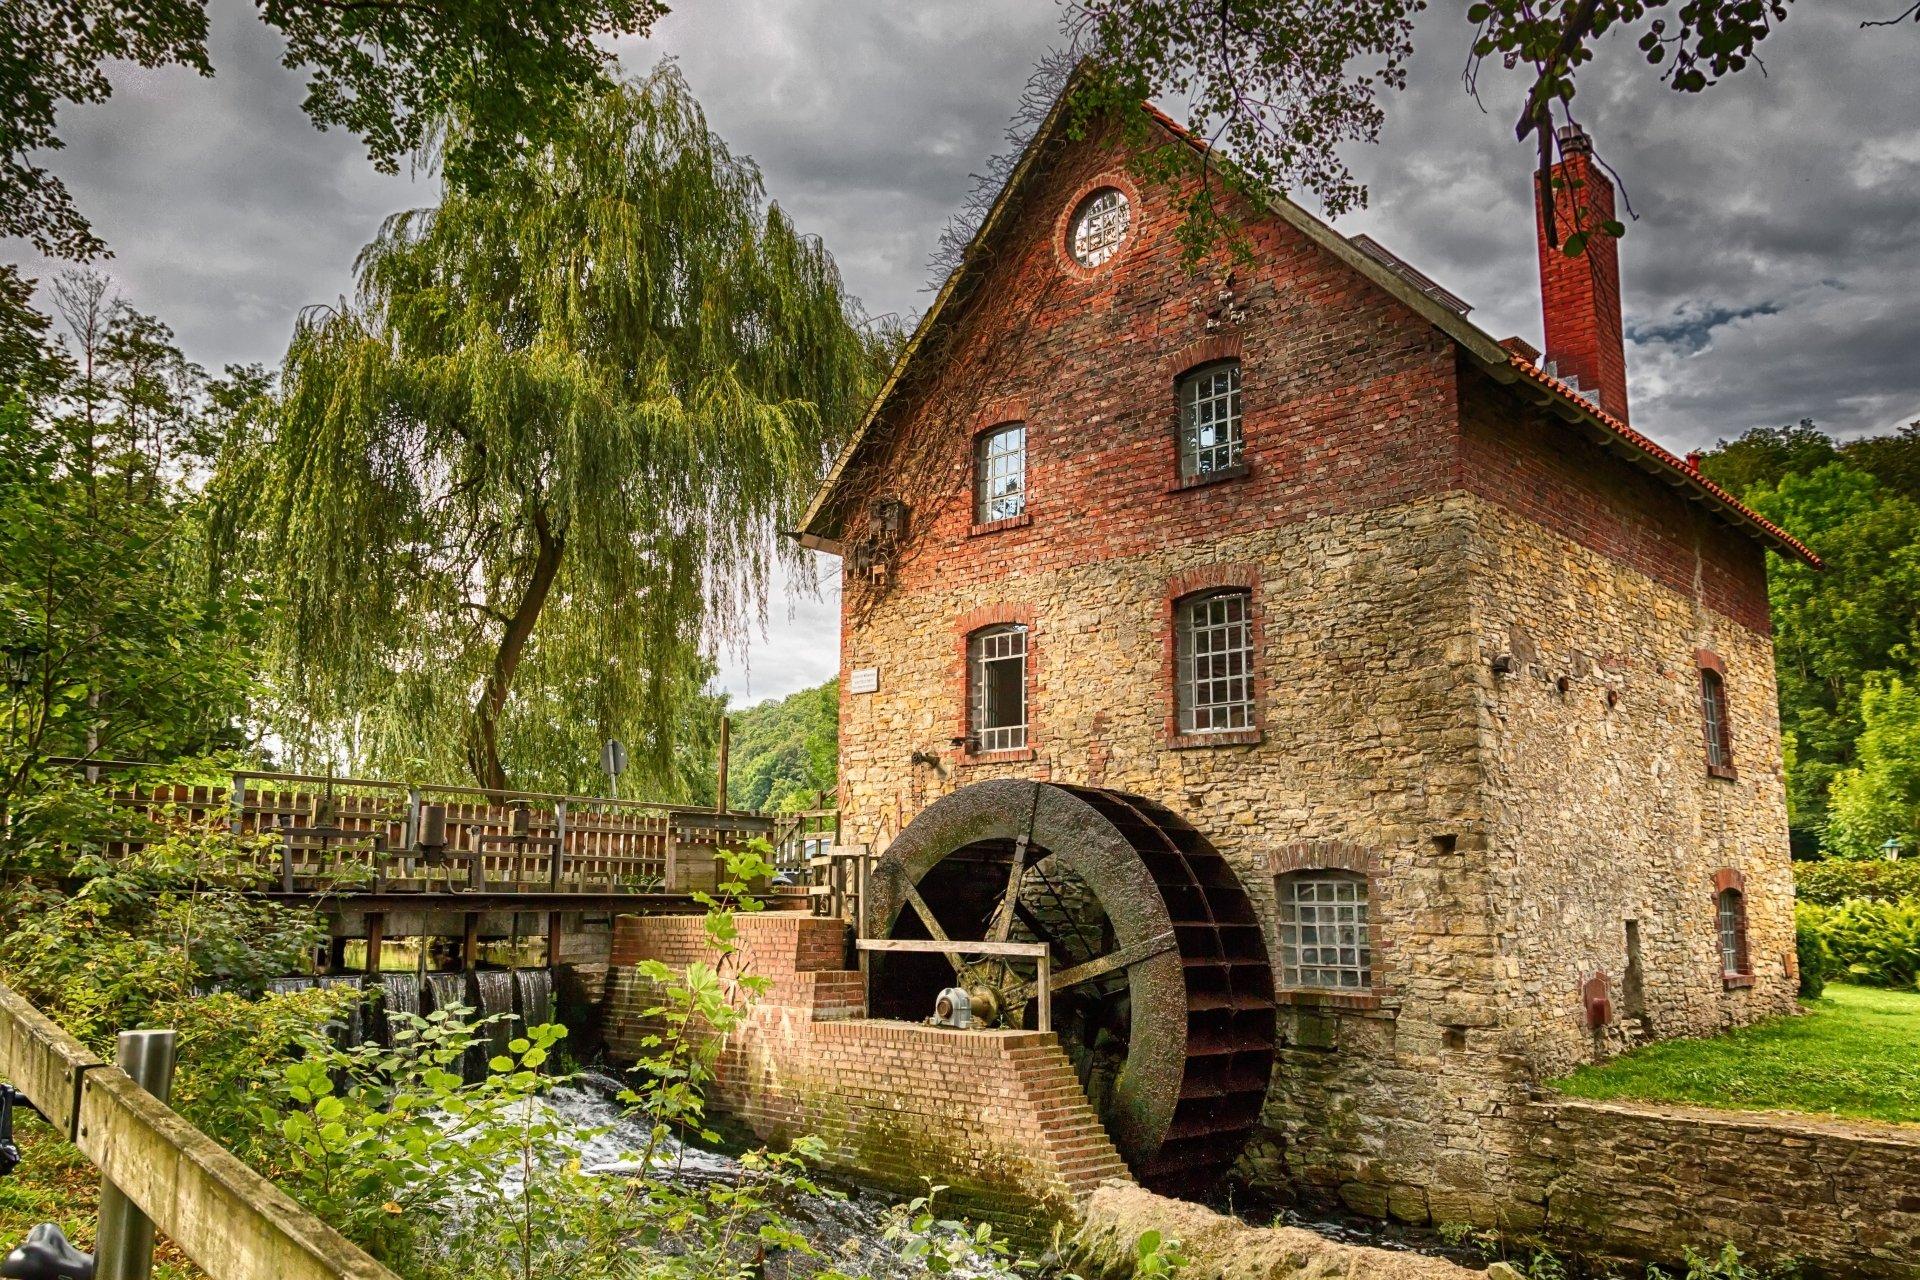 Iphone X Wallpaper Gif Landscape Watermill 5k Retina Ultra Hd Wallpaper Background Image